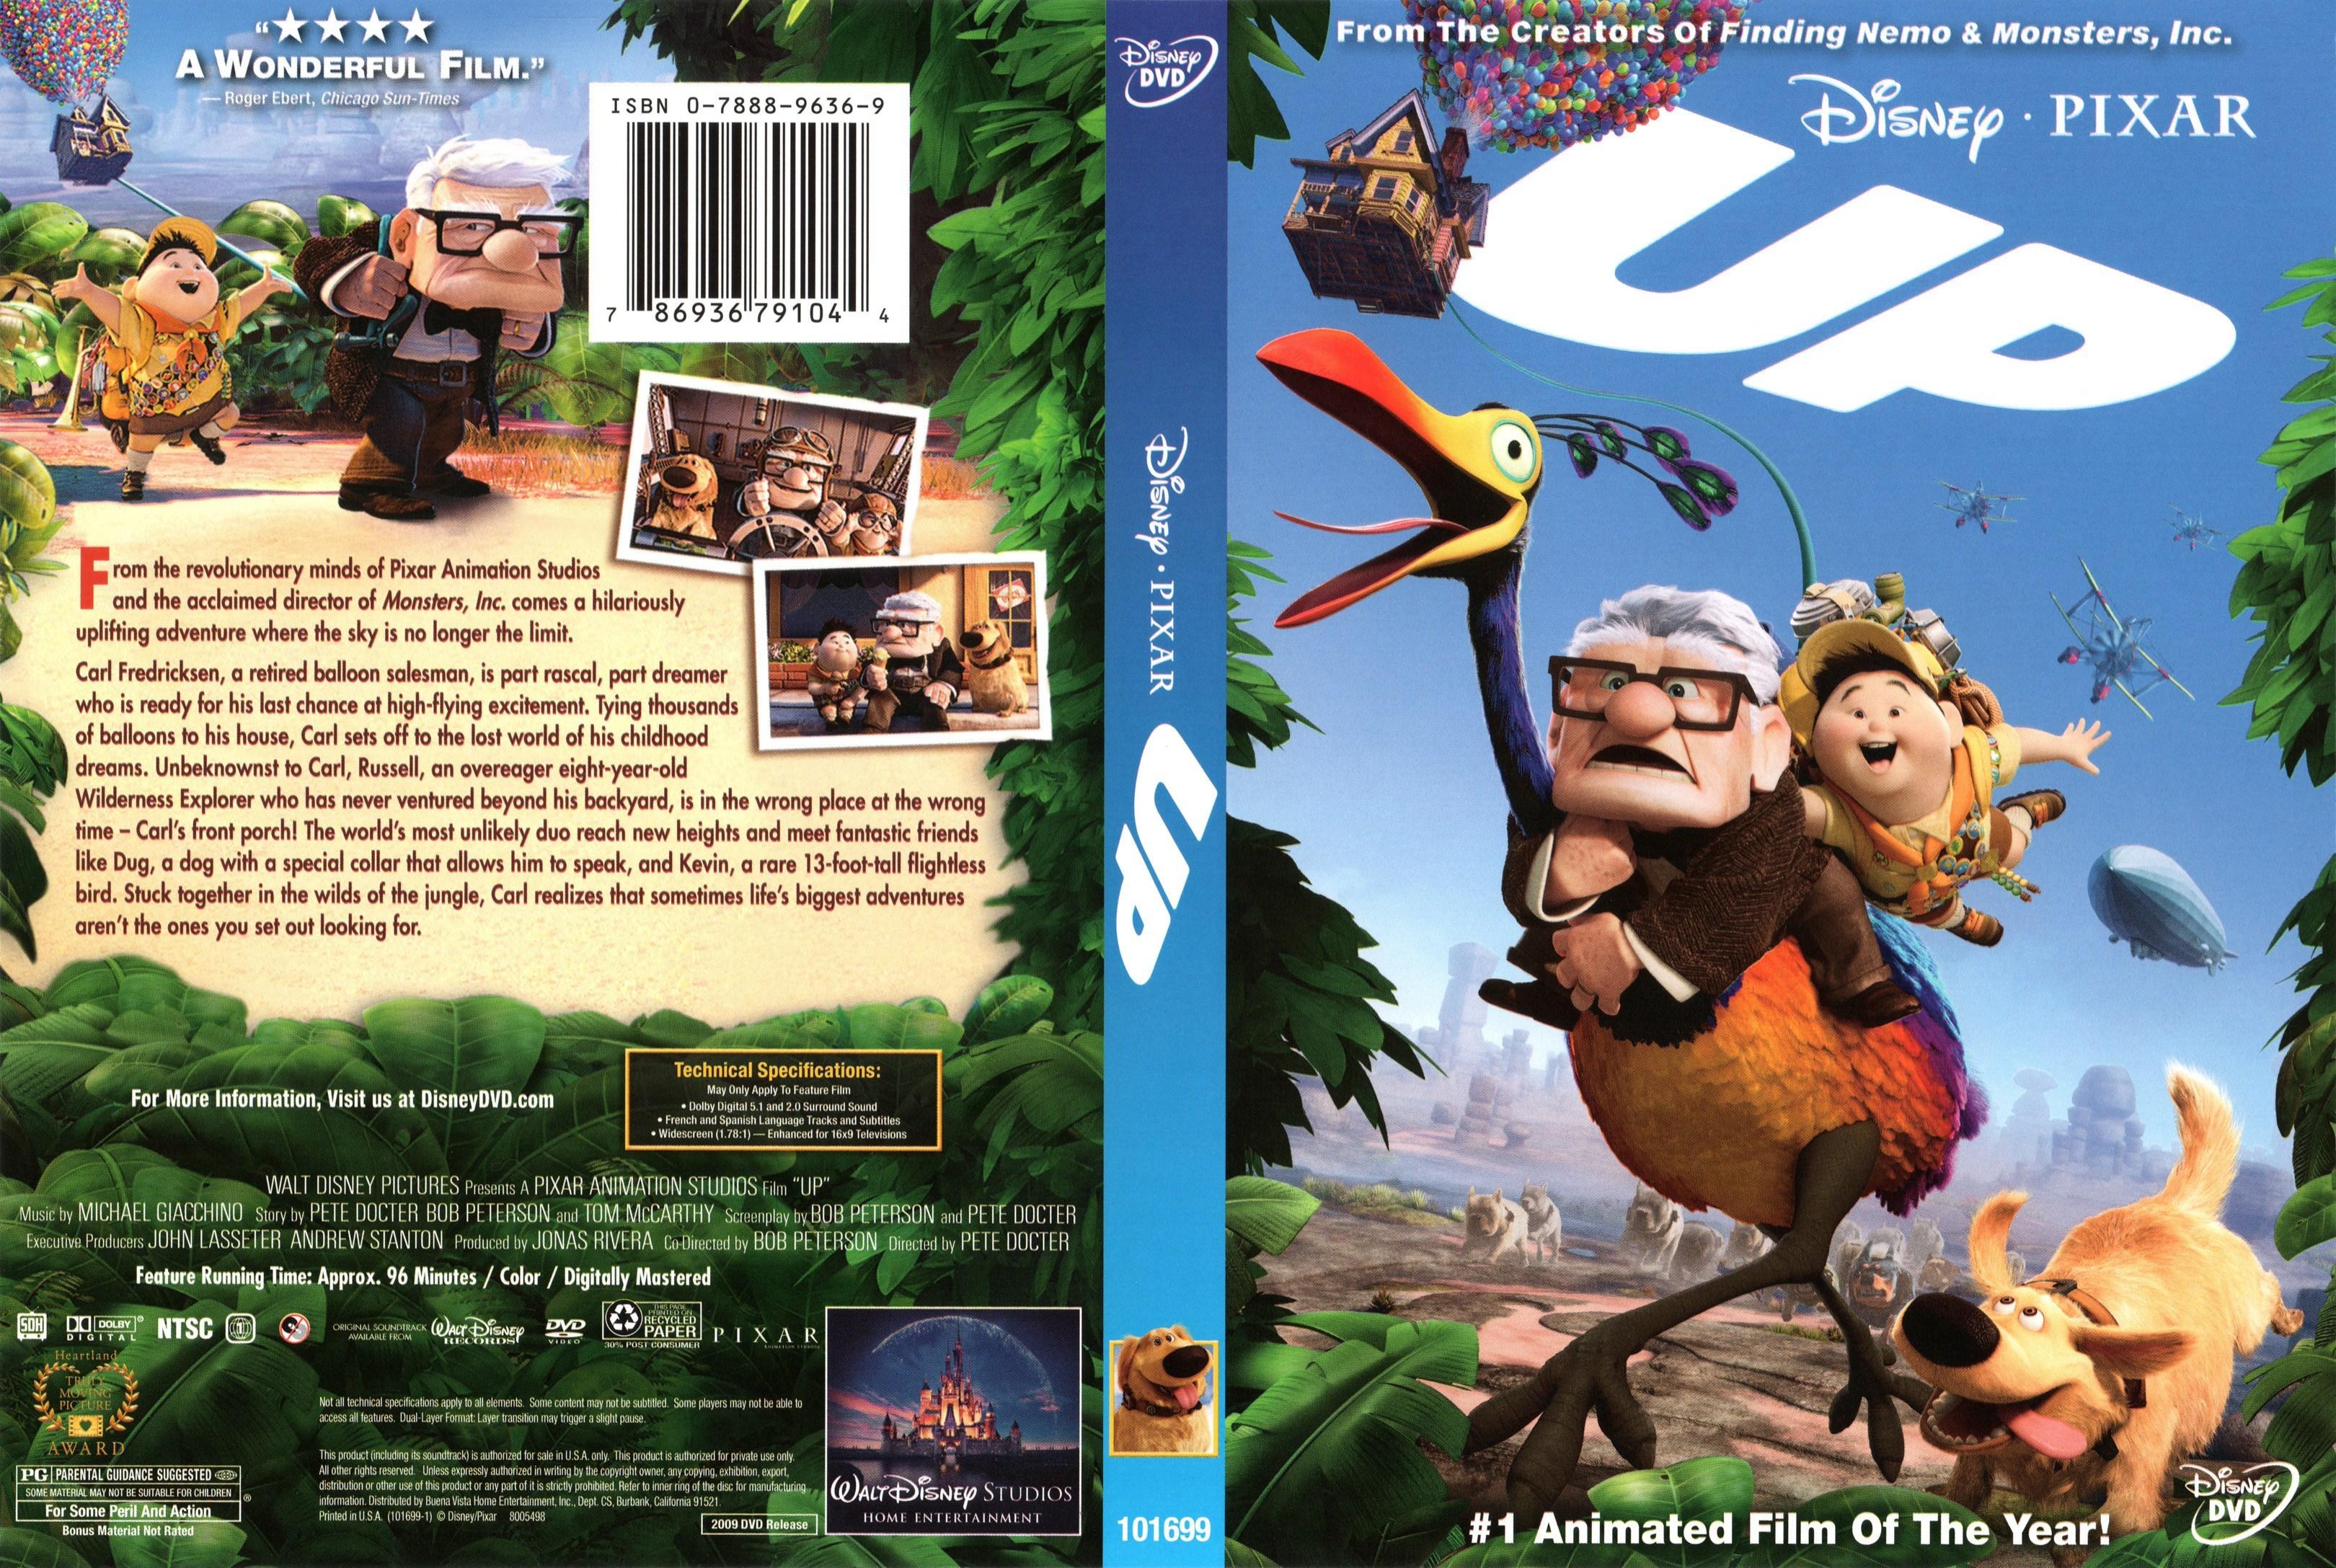 Pixar Shorts Collection Luxo Jr 1986 YouTube - YouTube